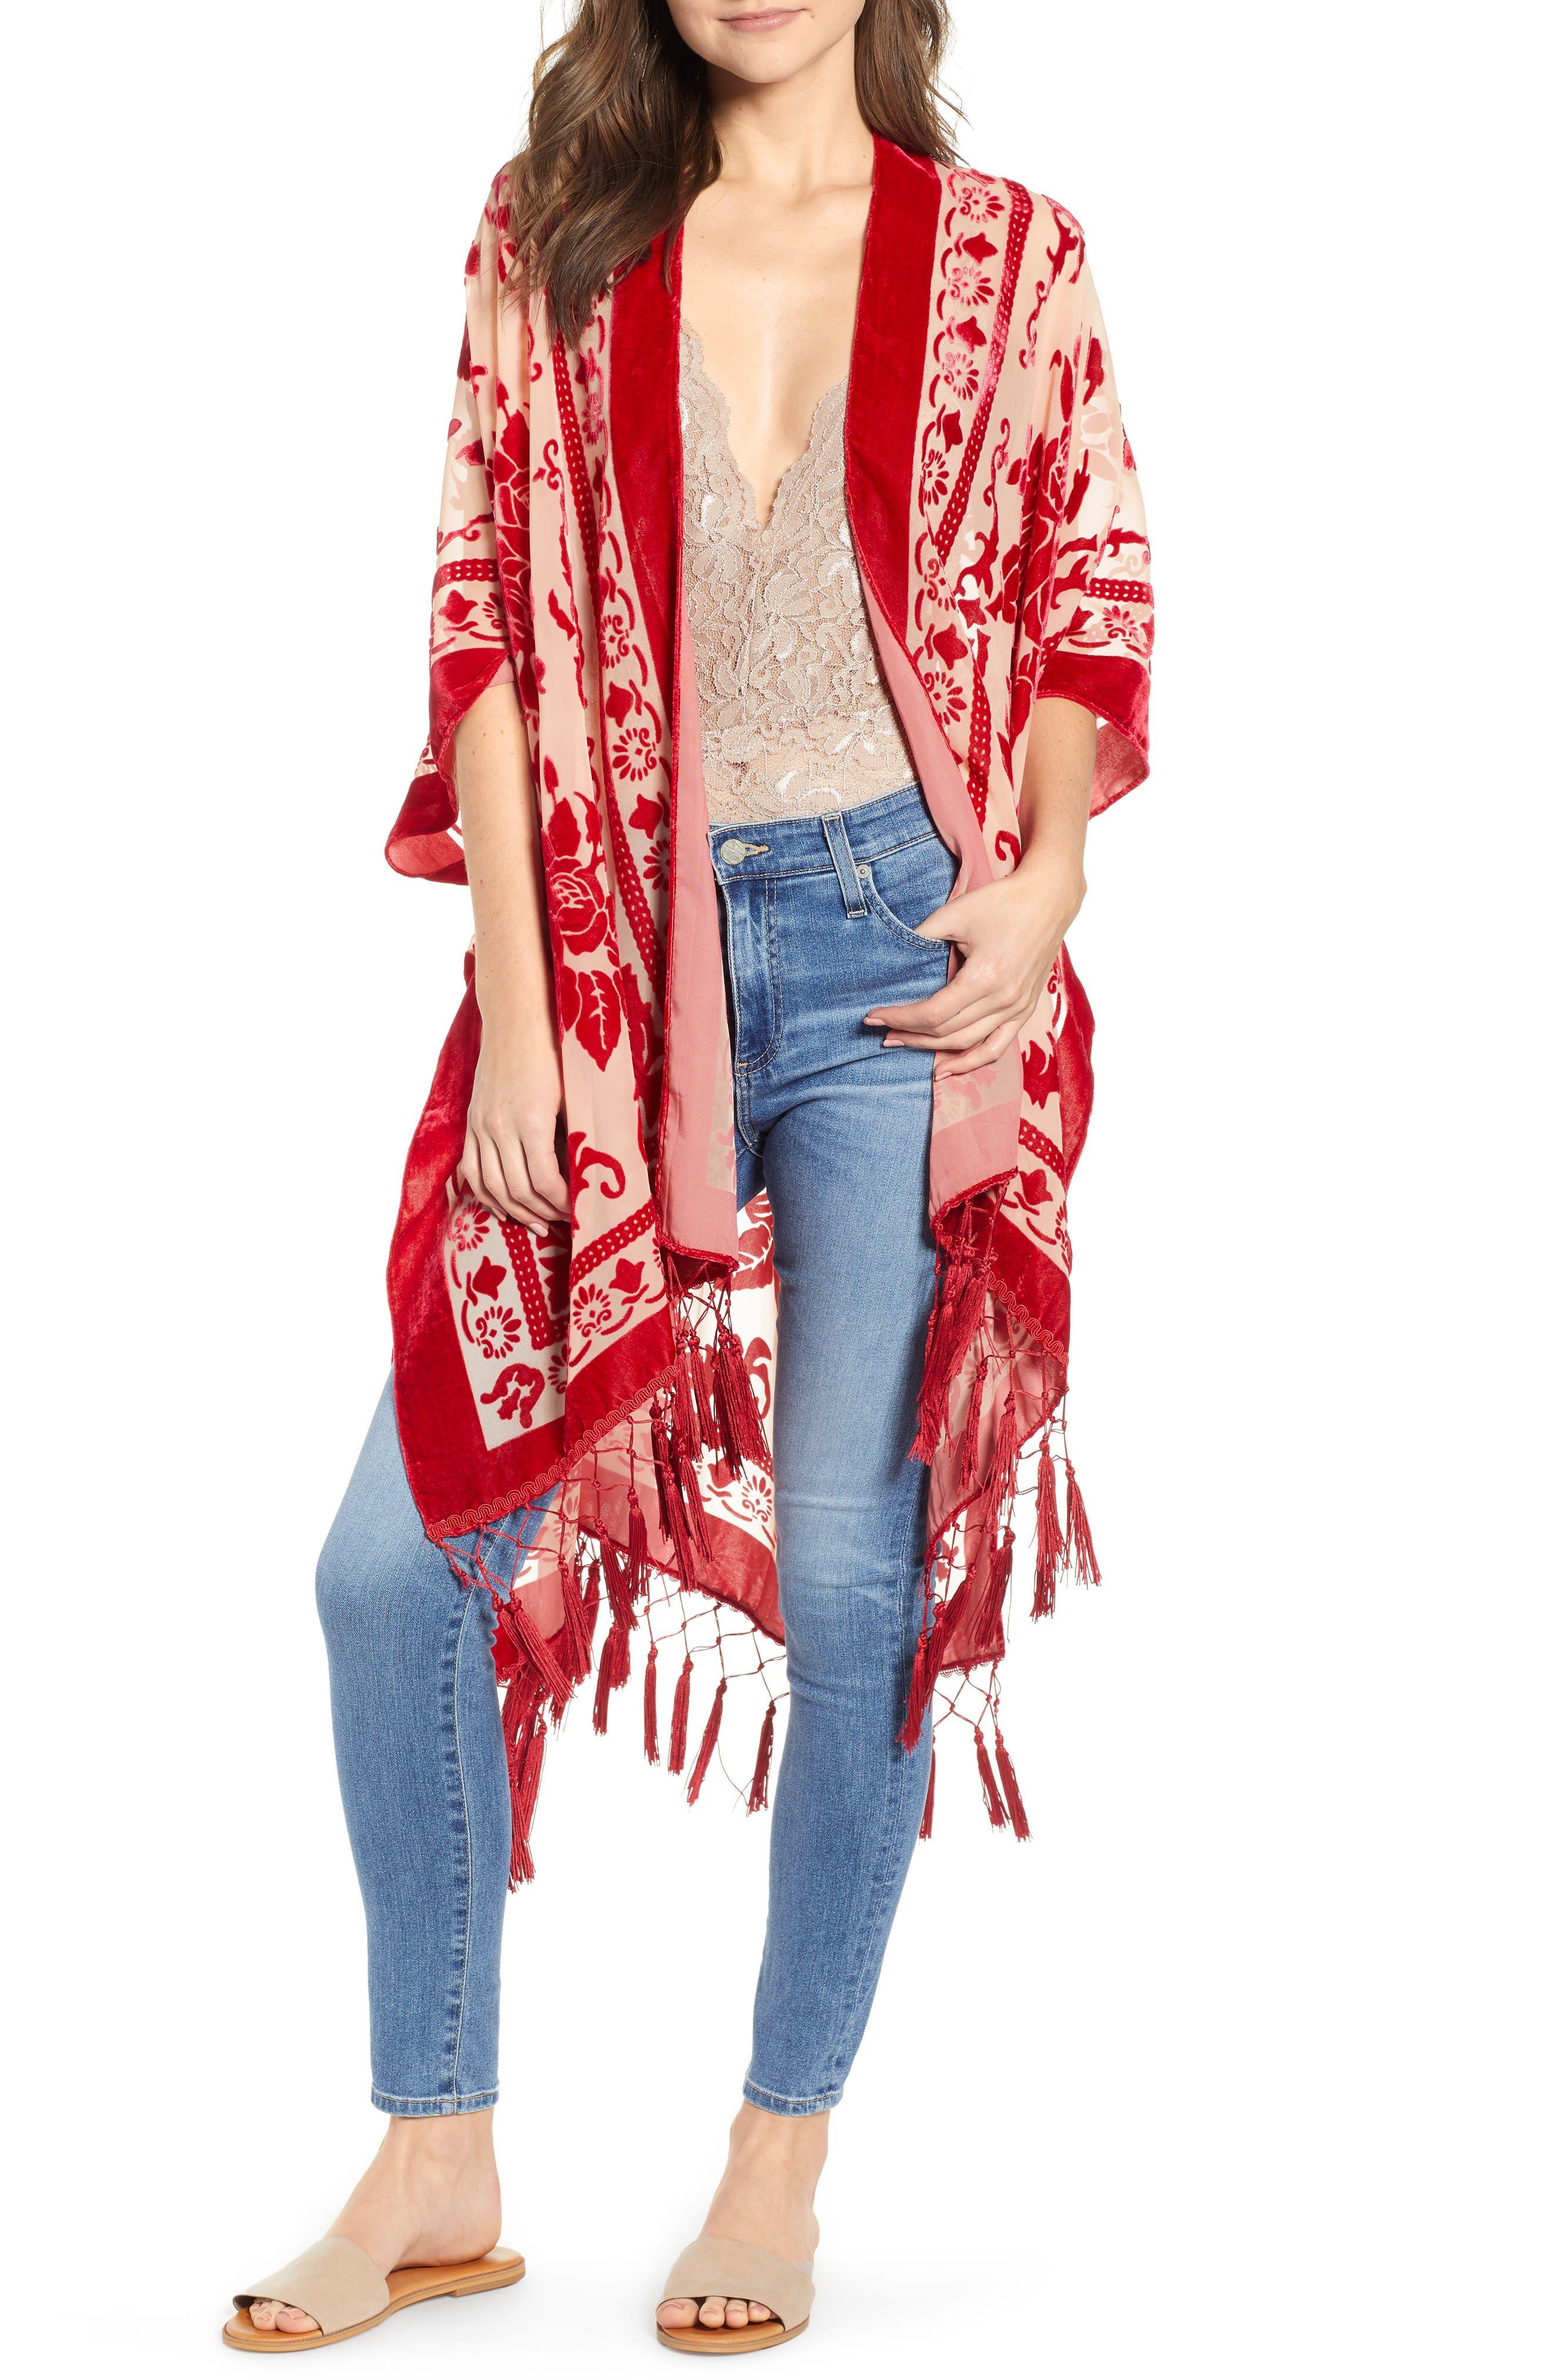 Shawls & Wraps | Vintage Lace & Fur Evening Scarves Womens Free People Nightbird Velvet Duster Size One Size - Red $88.00 AT vintagedancer.com